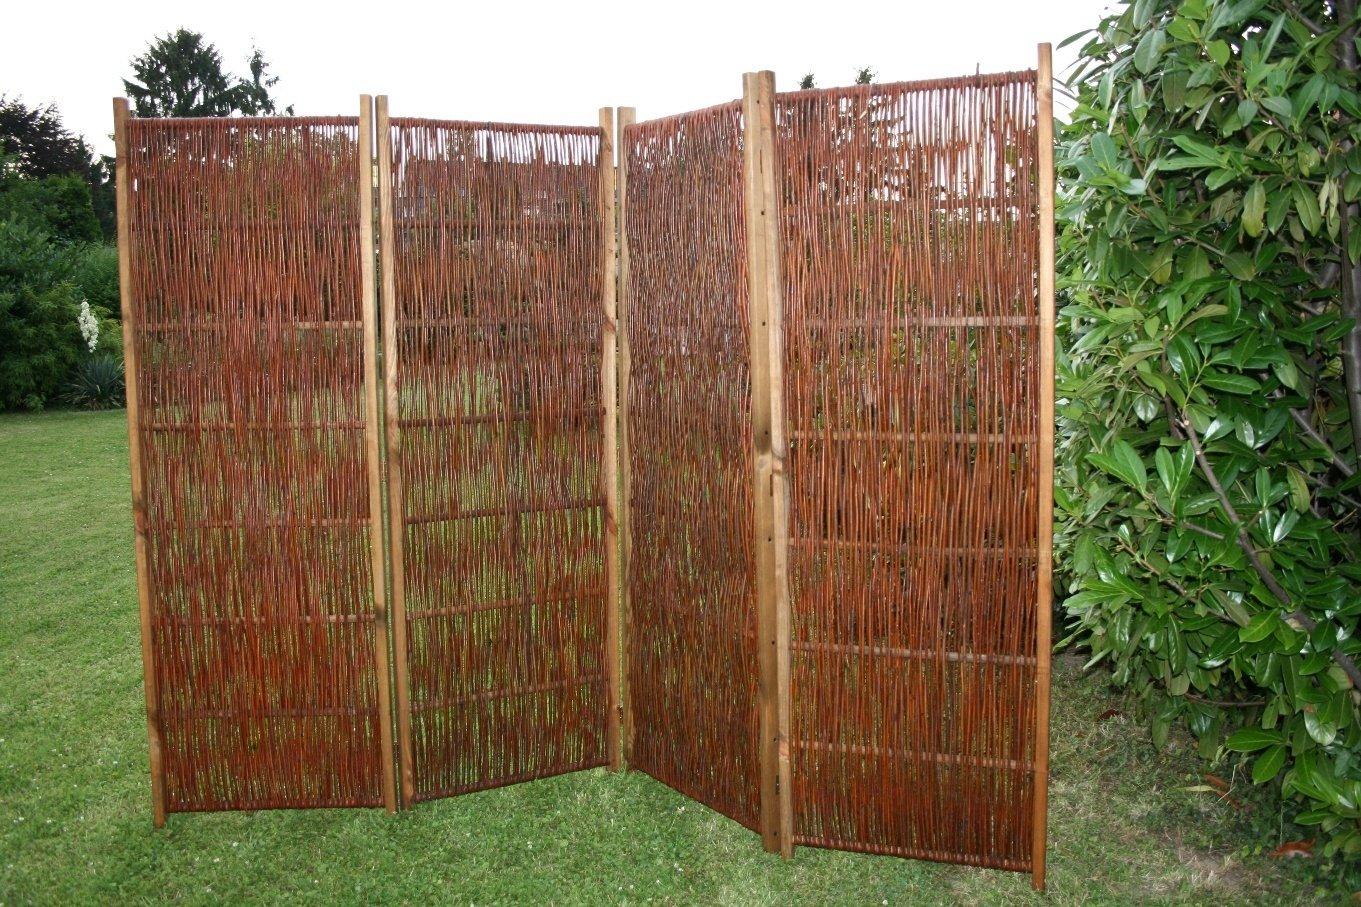 Paravent aus Weiden 240 x 180 cm